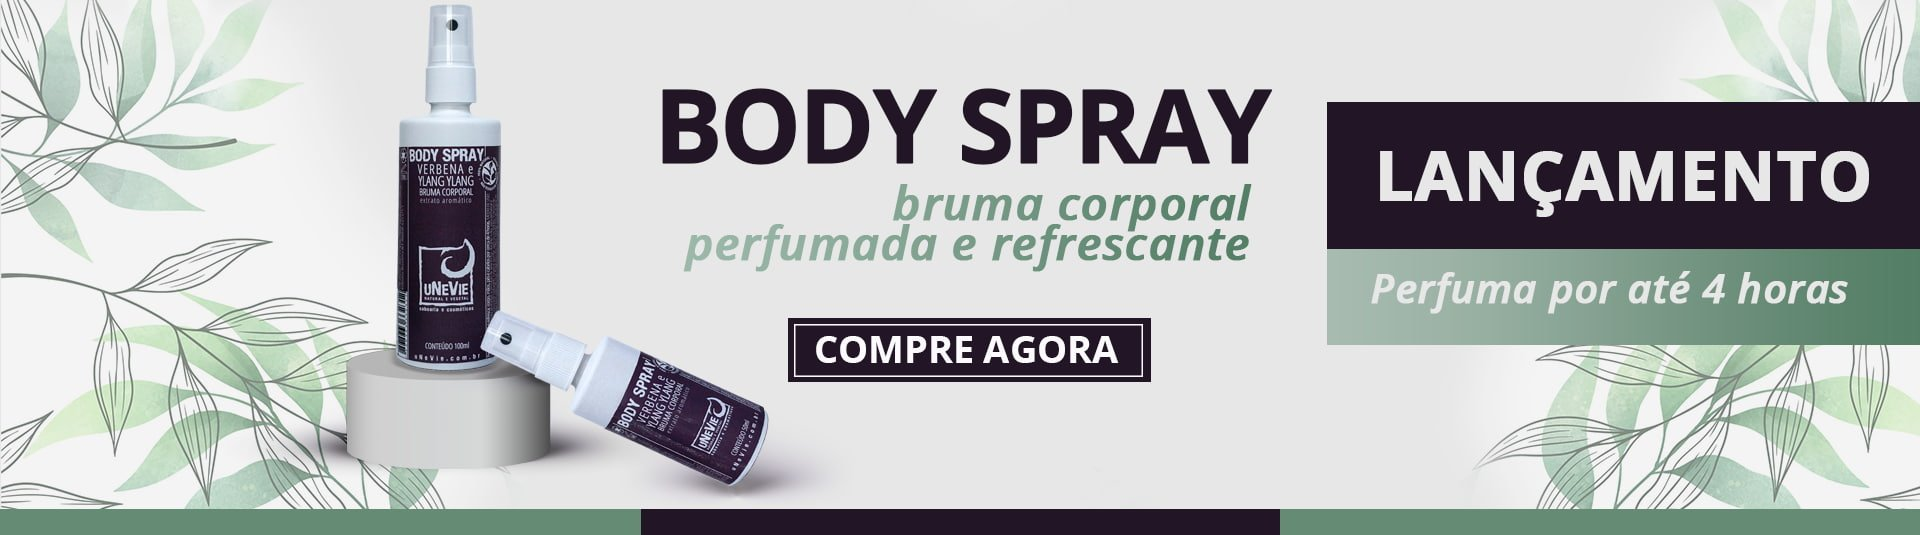 LR 2020-12-21 lançamento body spray